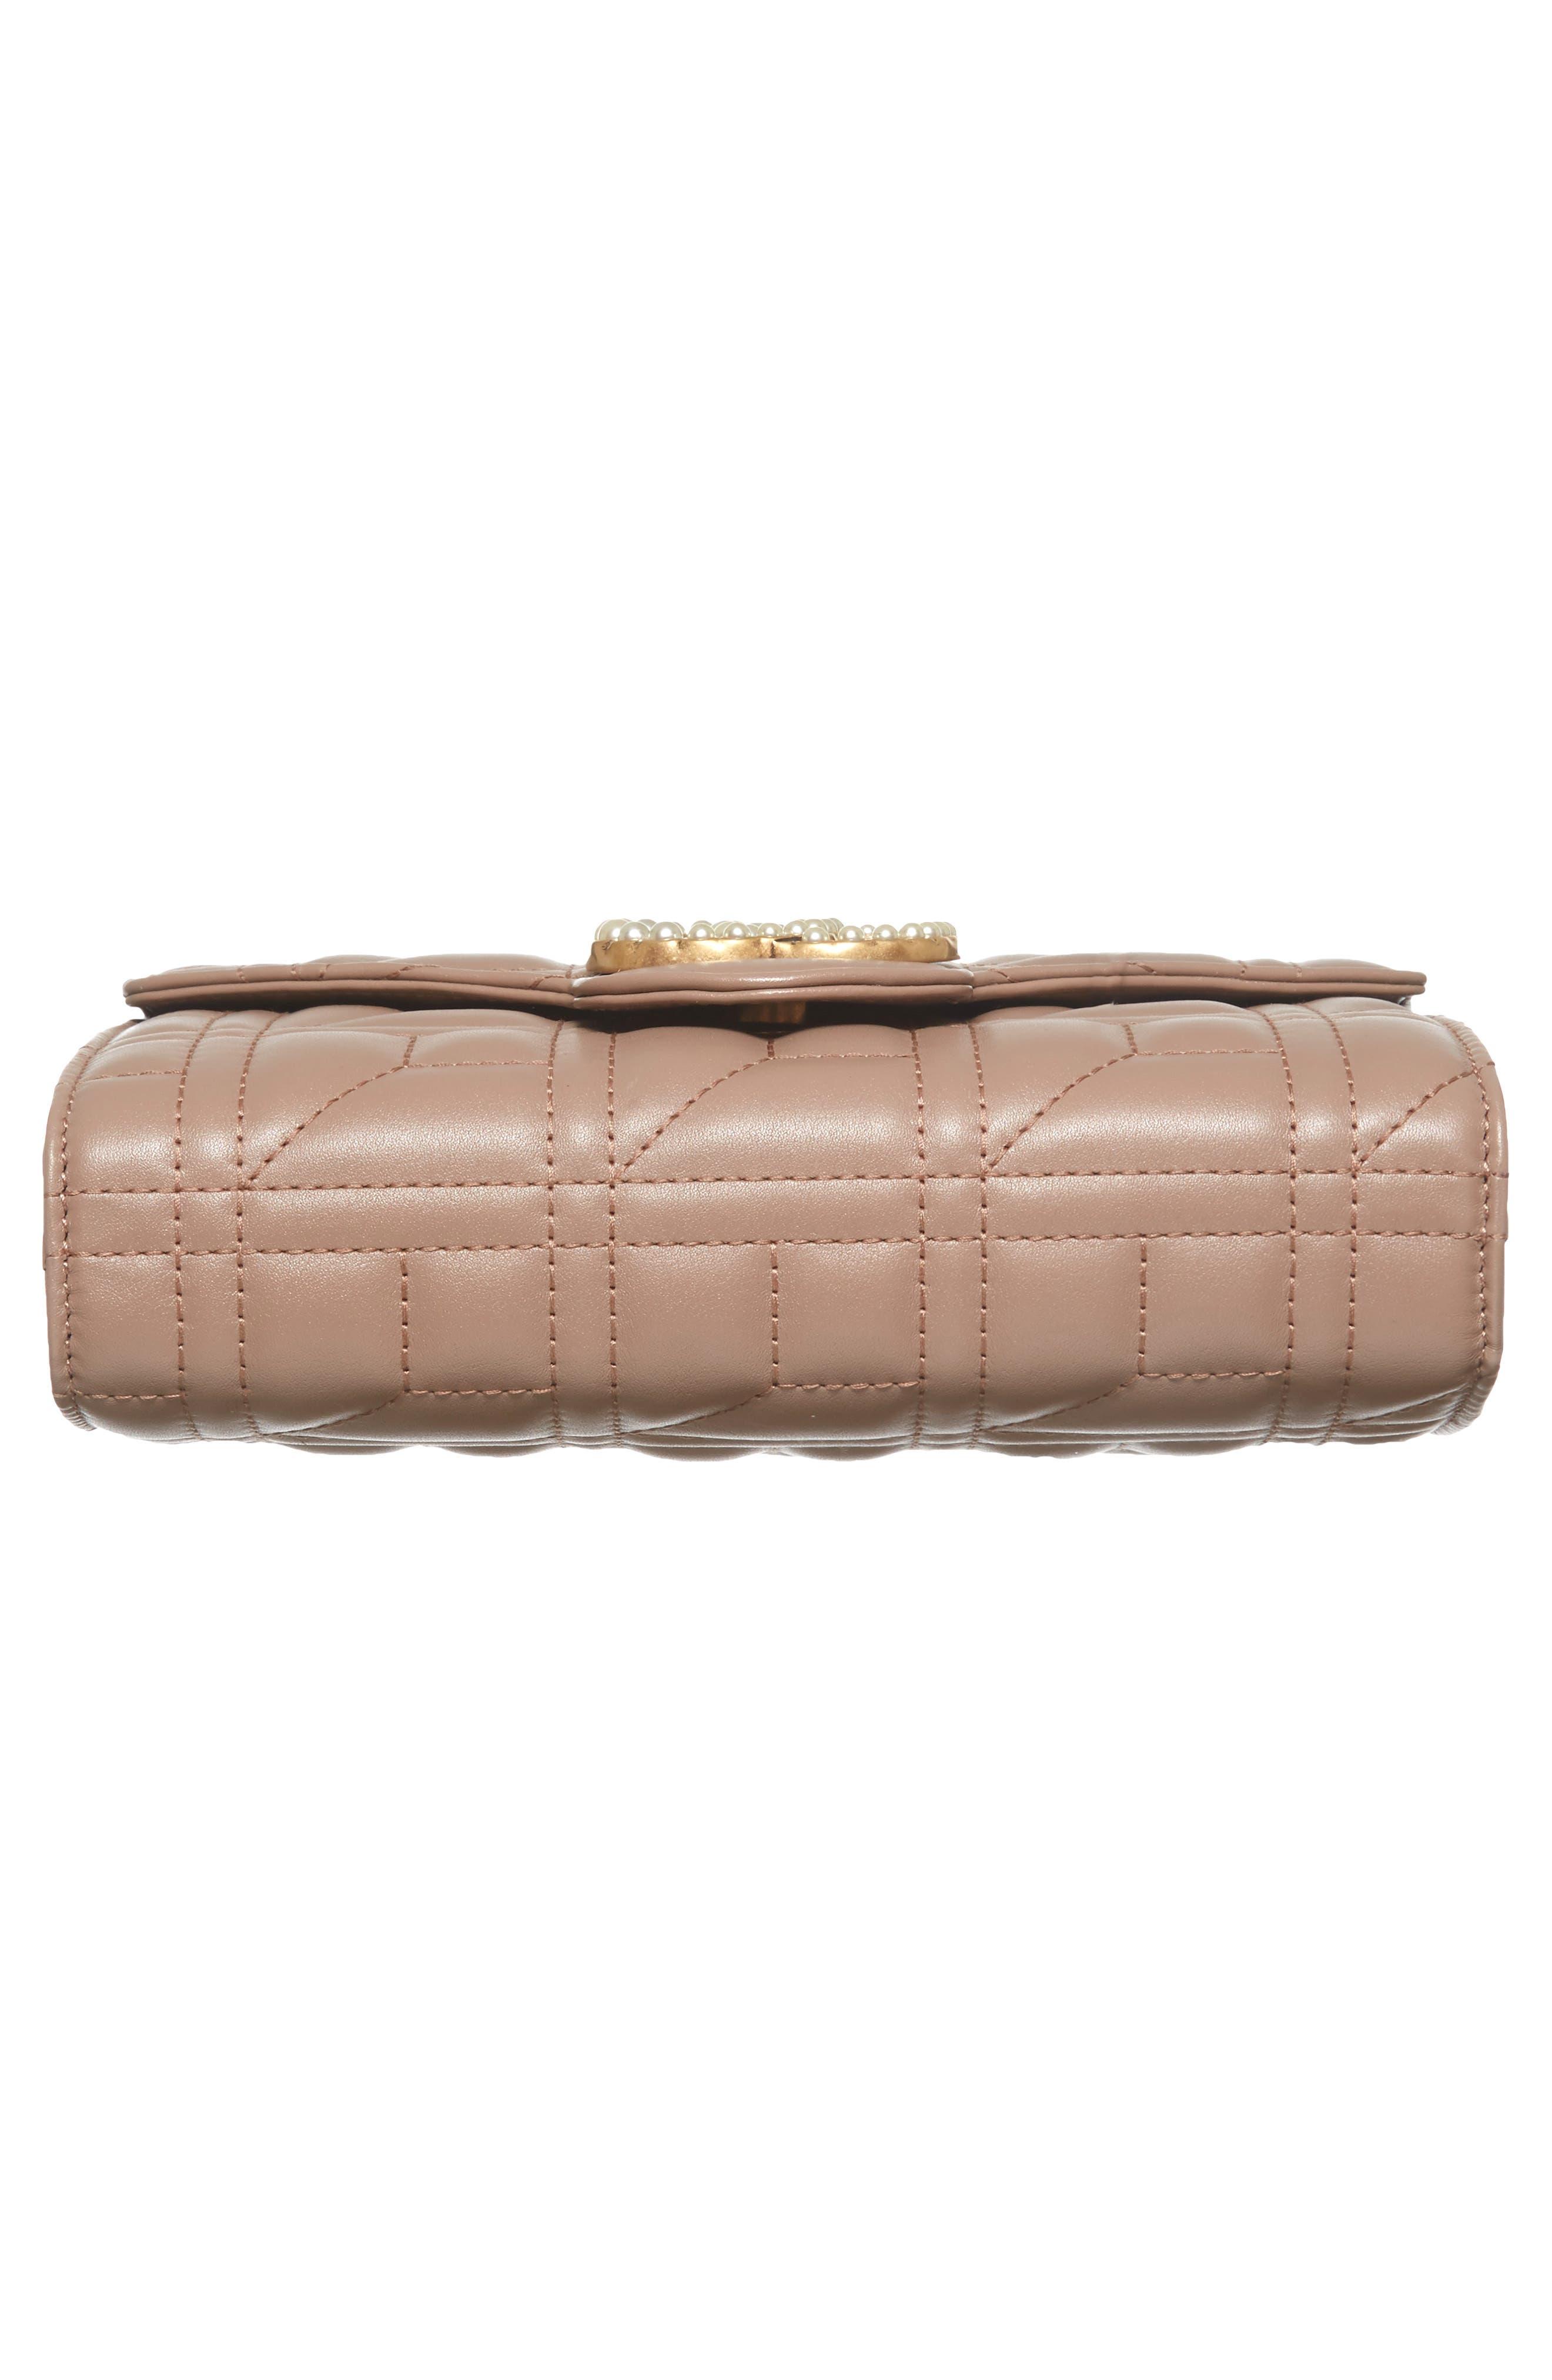 GG Marmont Matelassé Leather Wallet on a Chain,                             Alternate thumbnail 6, color,                             636